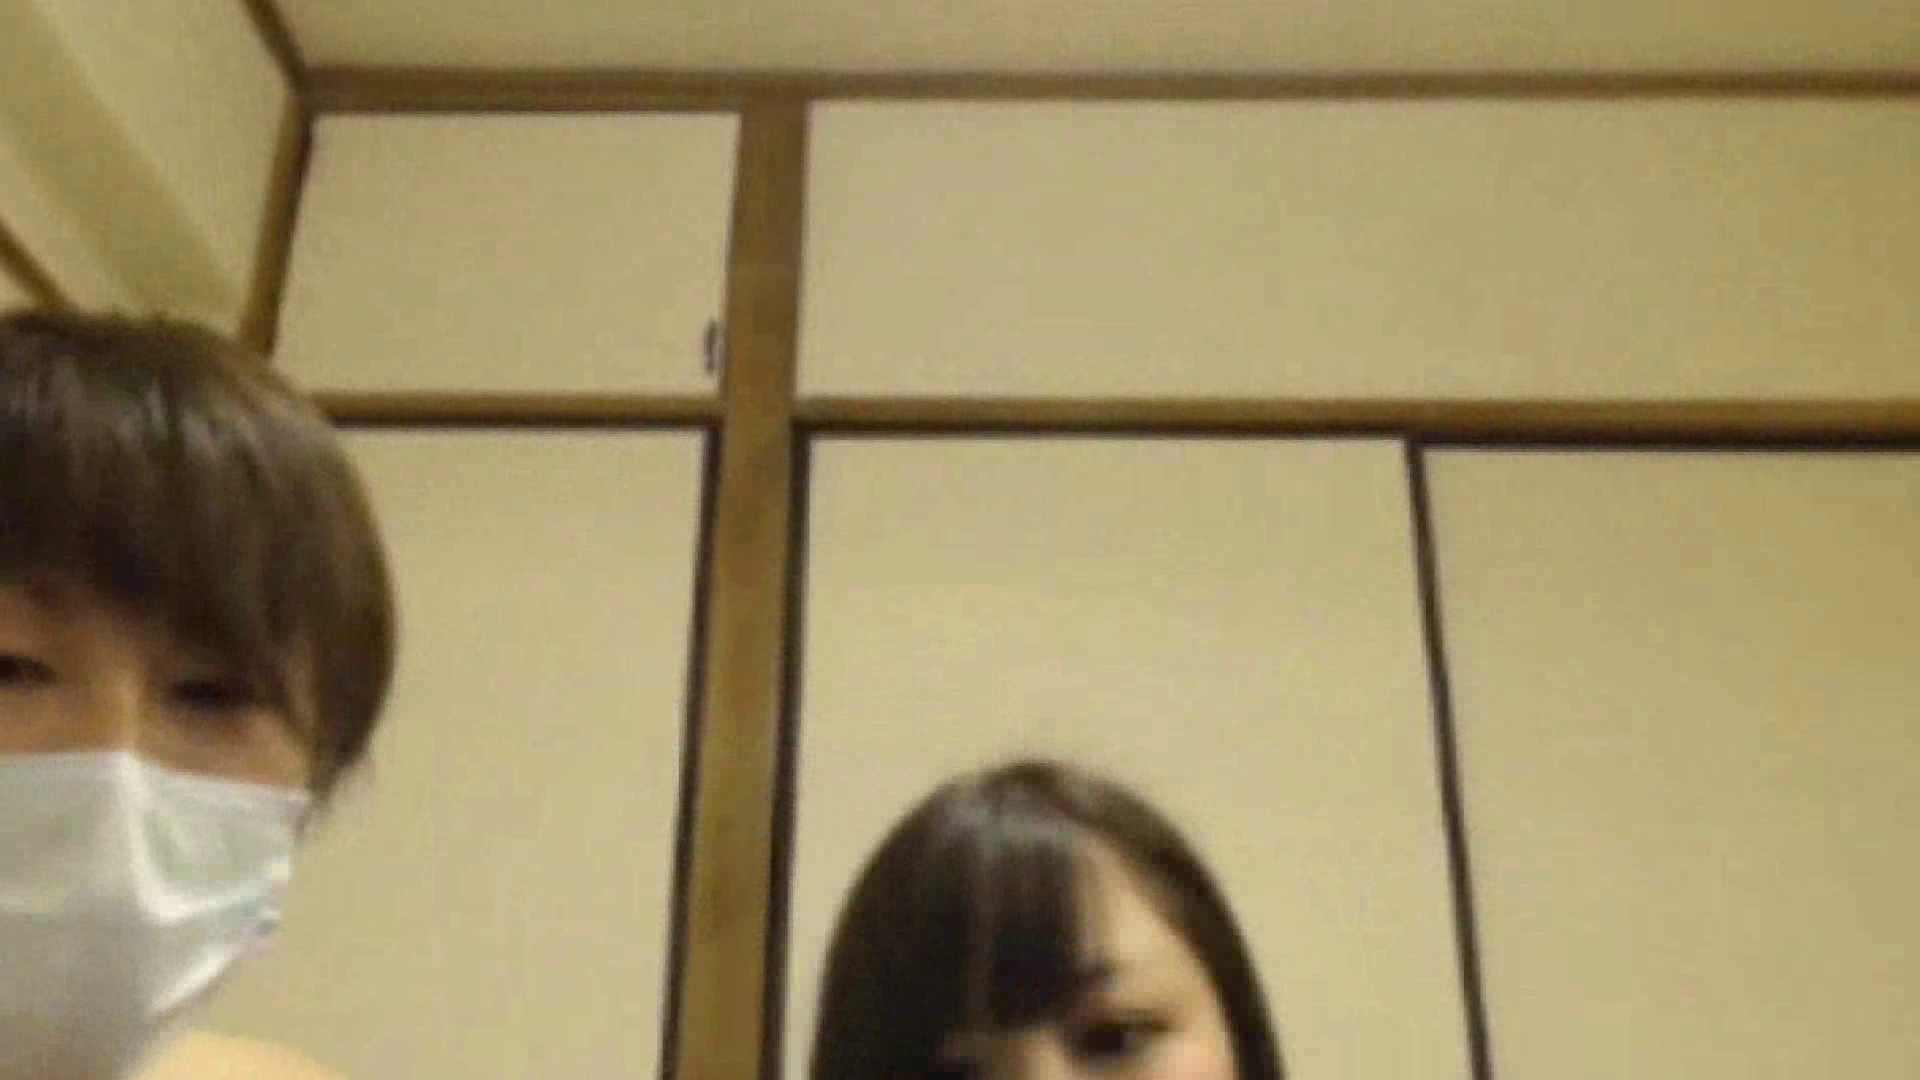 S級ギャルのハメ撮り!生チャット!Vol.21前編 美女丸裸 ワレメ無修正動画無料 89pic 19